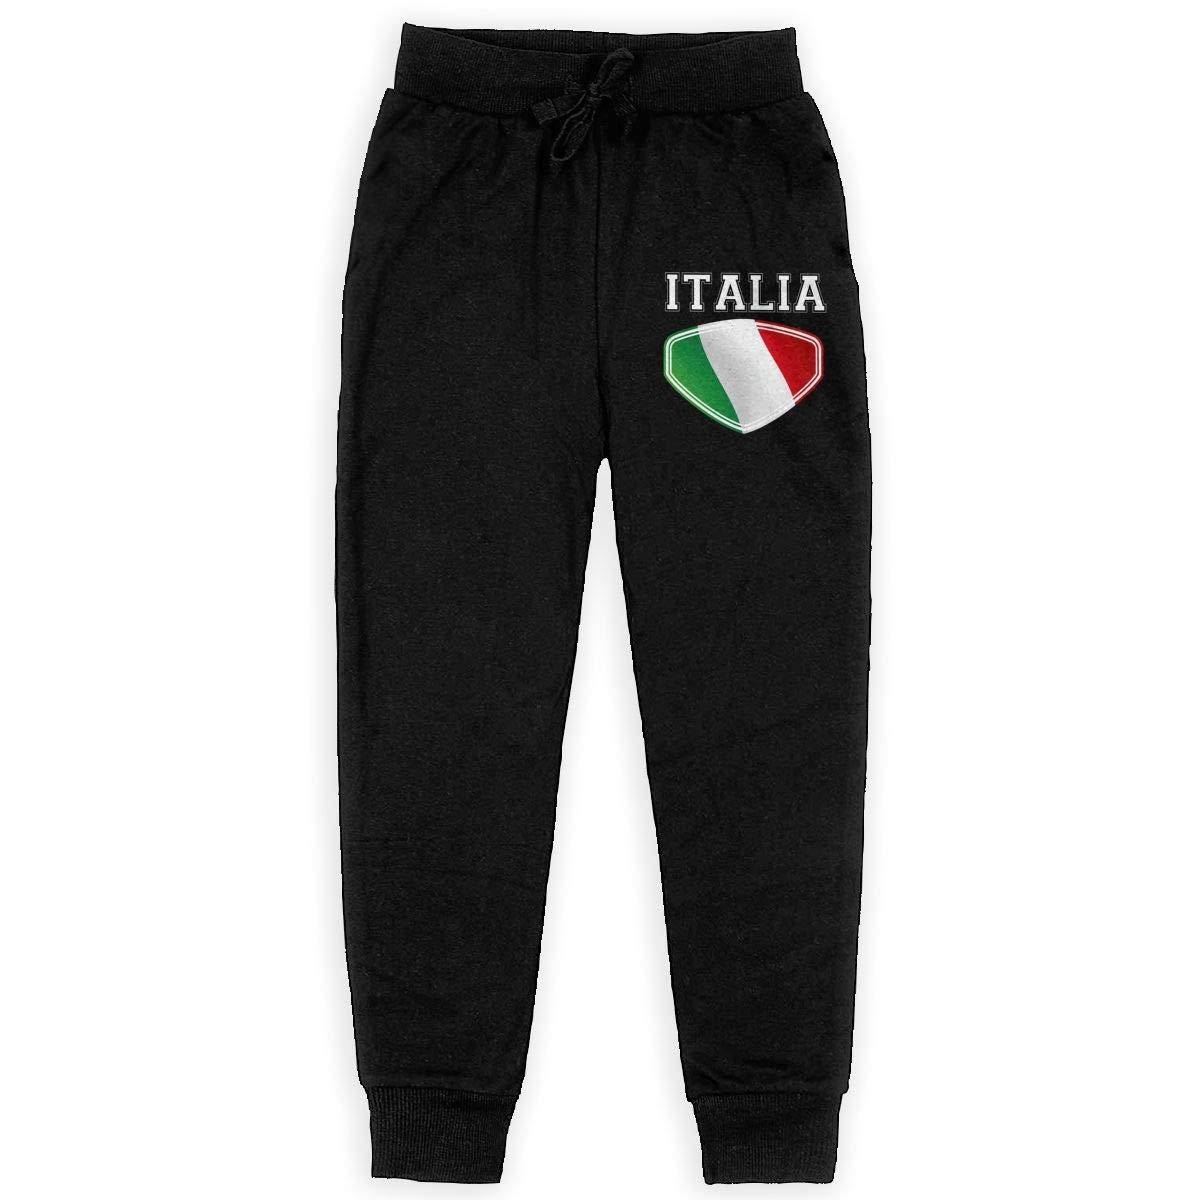 XinT Italia Italy Italian Flag Teenagers Boys Sweatpants Fashion Pants with Pockets